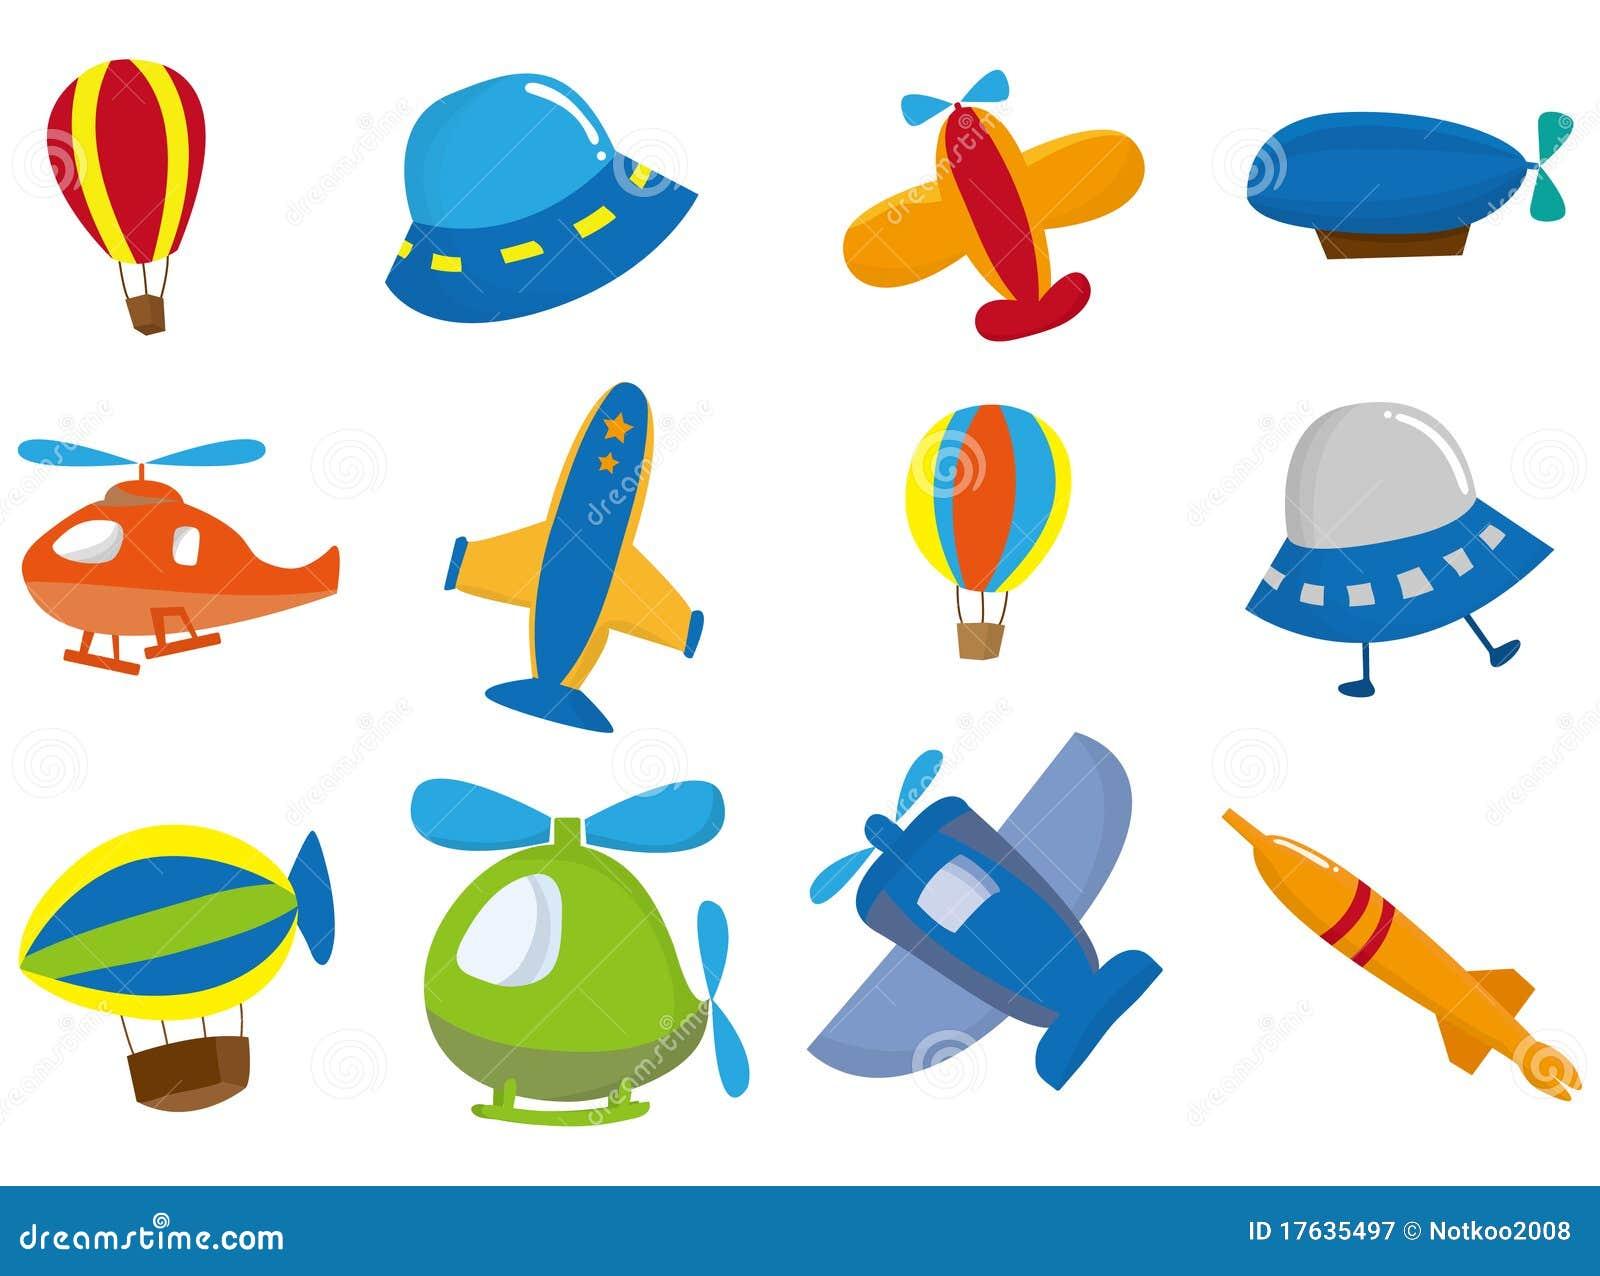 Cartoon Airplane Icon Royalty Free Stock Photography Image 17635497